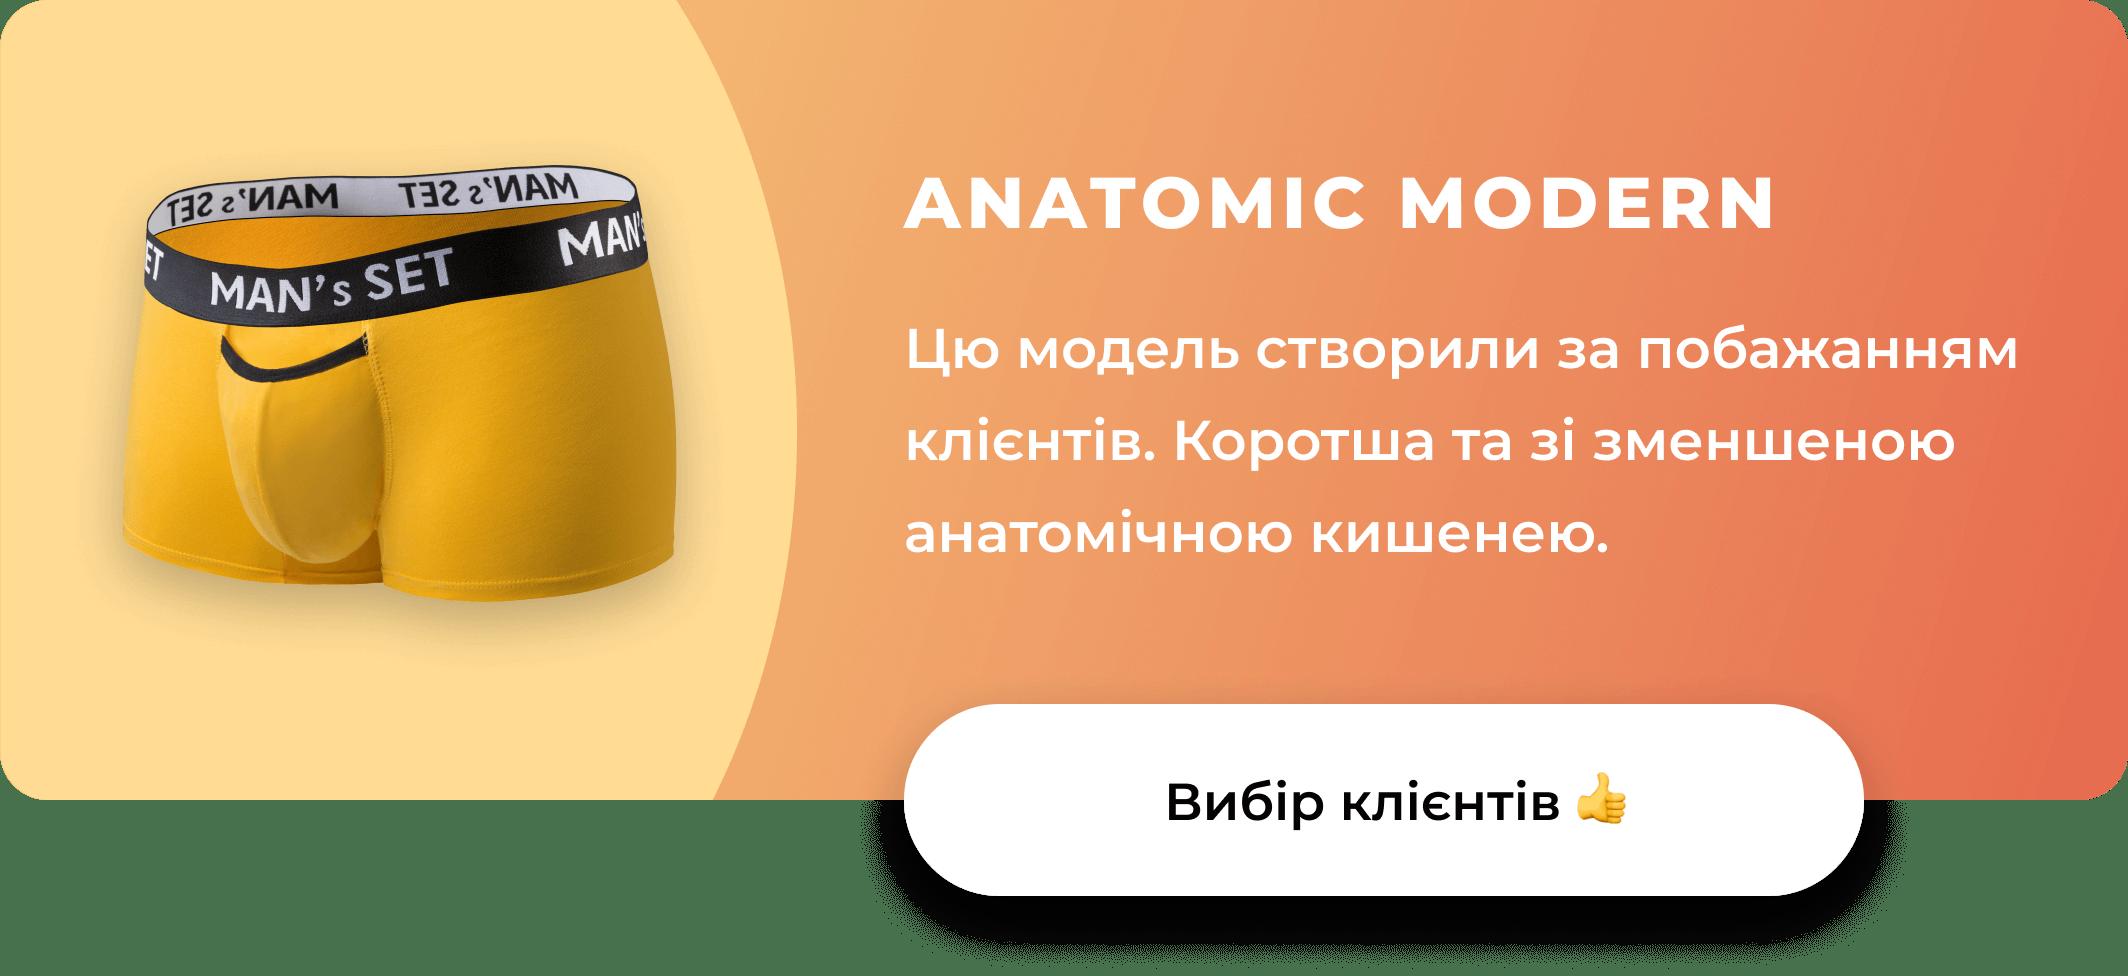 Анатомічні боксери Modern